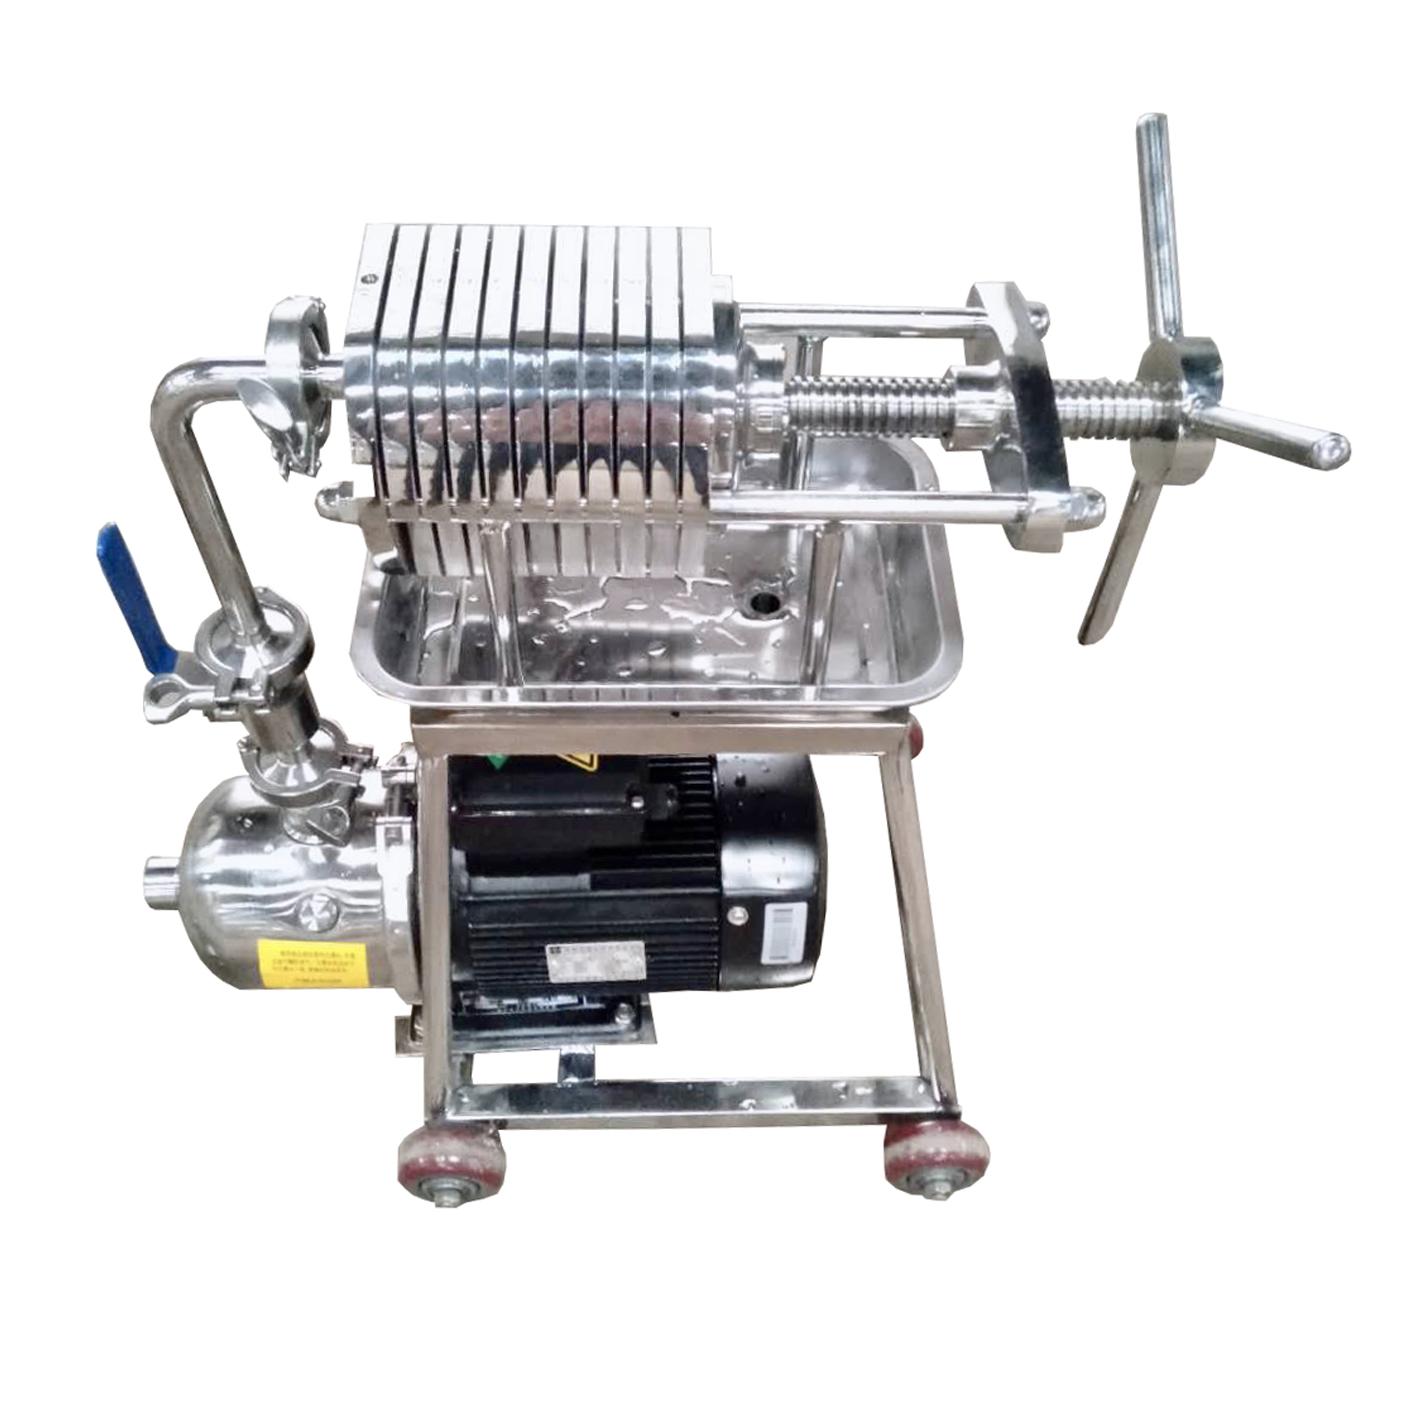 Coconut Oil Filter Press/Peanut Oil Filter Machine/Beer Filtration System Bas